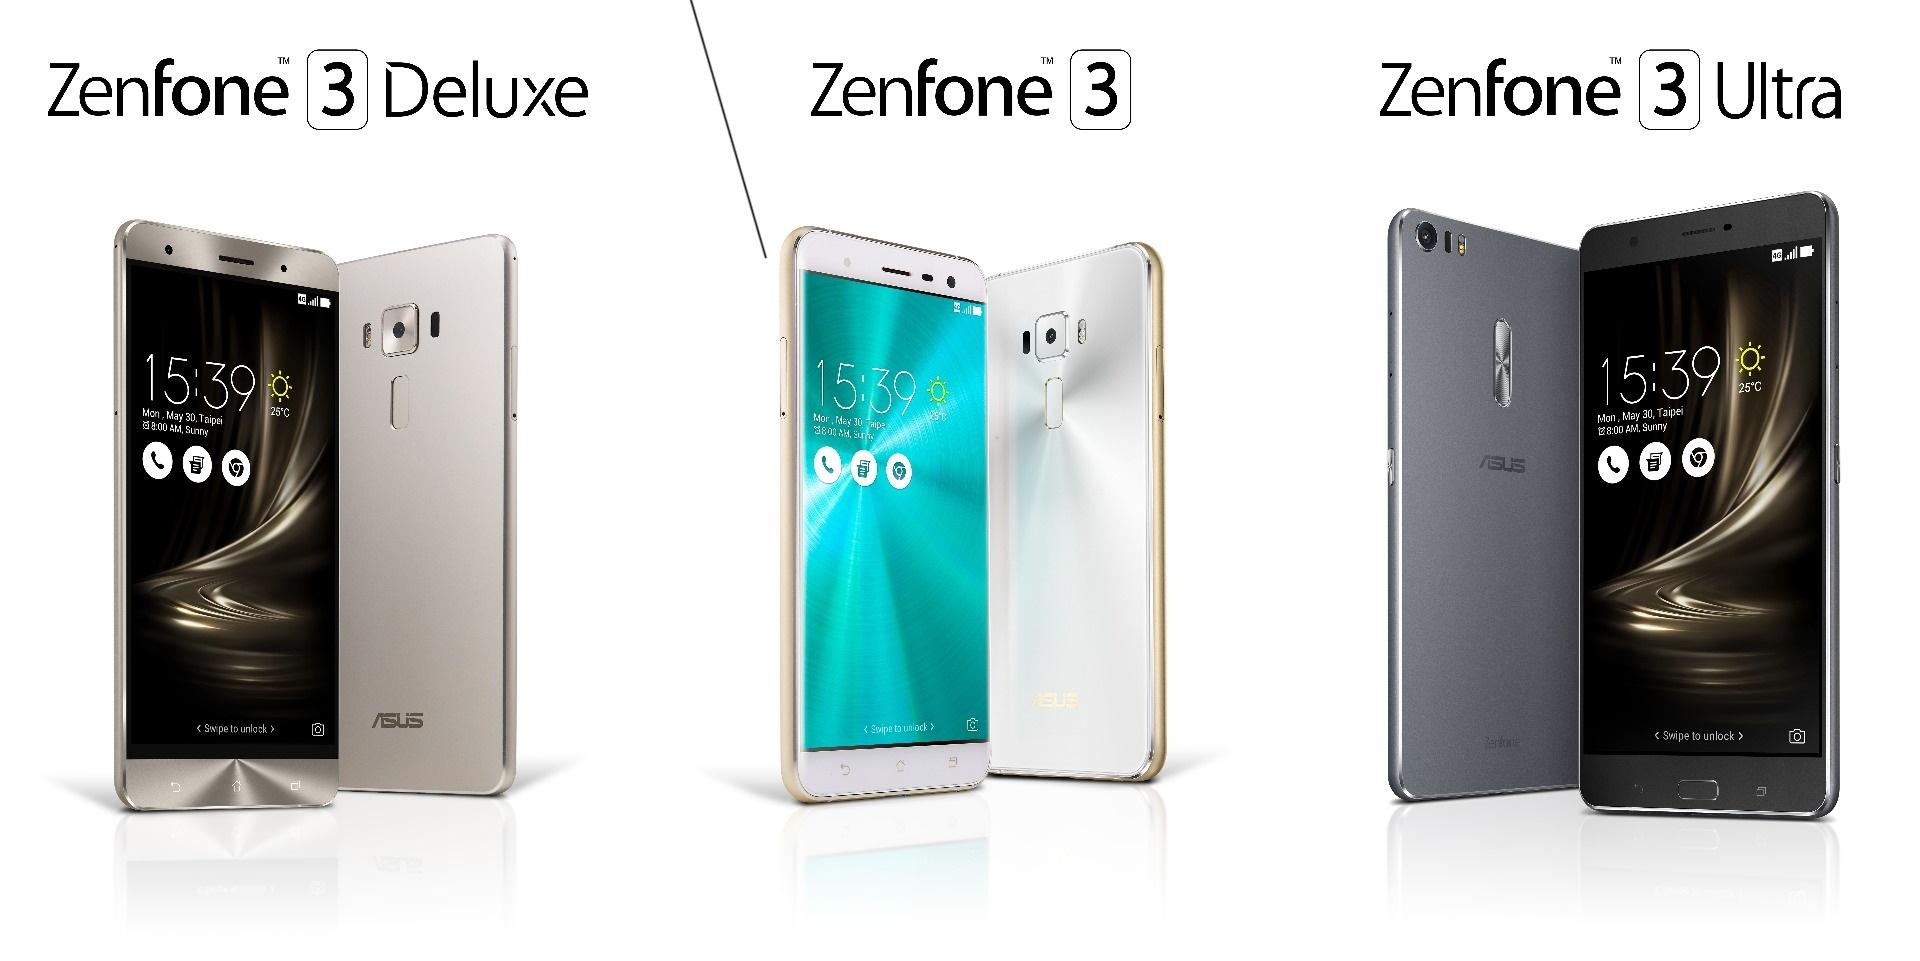 ZenFone 3日本版高すぎ問題!ZE520KL(5.2インチ)39,800円、Deluxeは55,800円~【正式発表後の内容に修正】